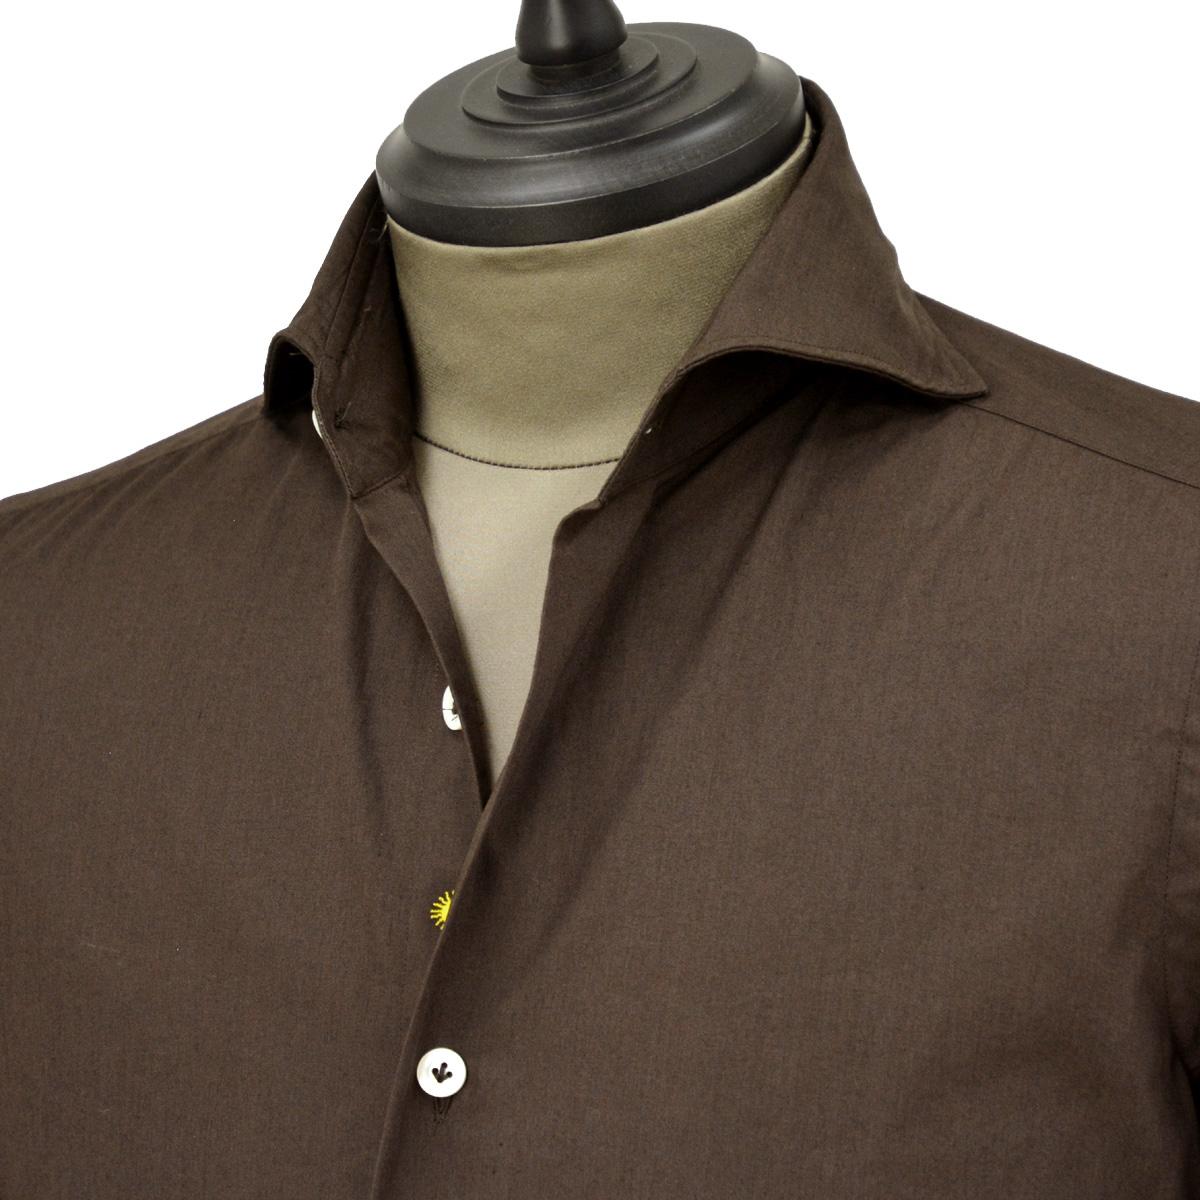 Giannetto【ジャンネット】カジュアルシャツ SLIM FIT 9G10330L84 008 ポプリン ブラウン